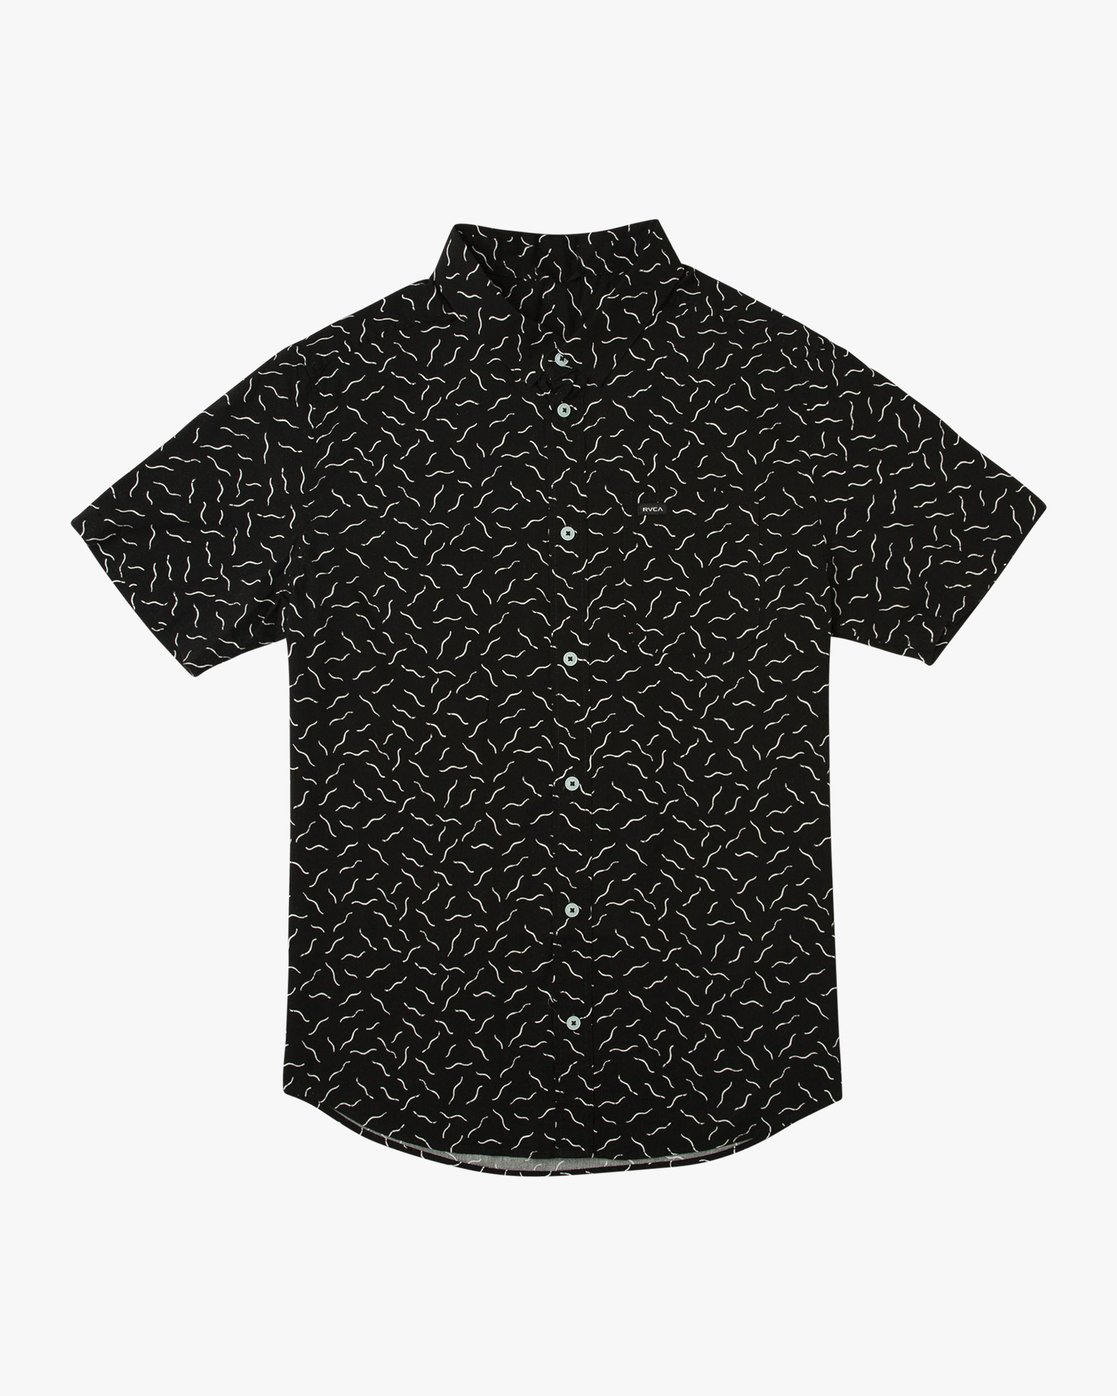 0 ANP Pack Button-Up Shirt Black M561URPP RVCA